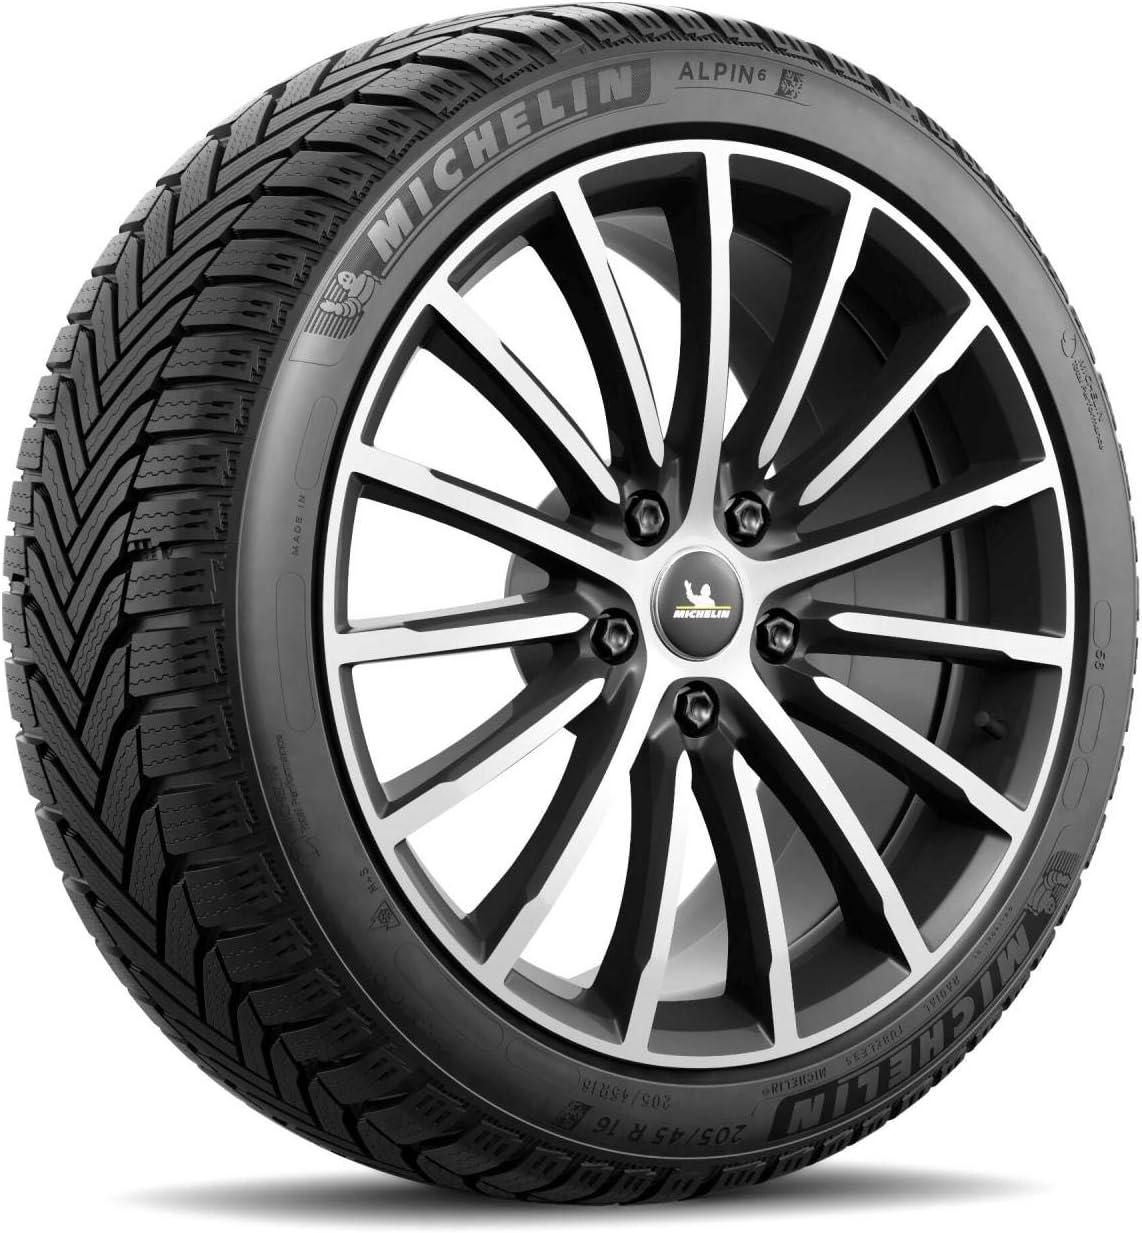 Reifen Winter Michelin Alpin 6 205 45 R16 87h Xl Auto